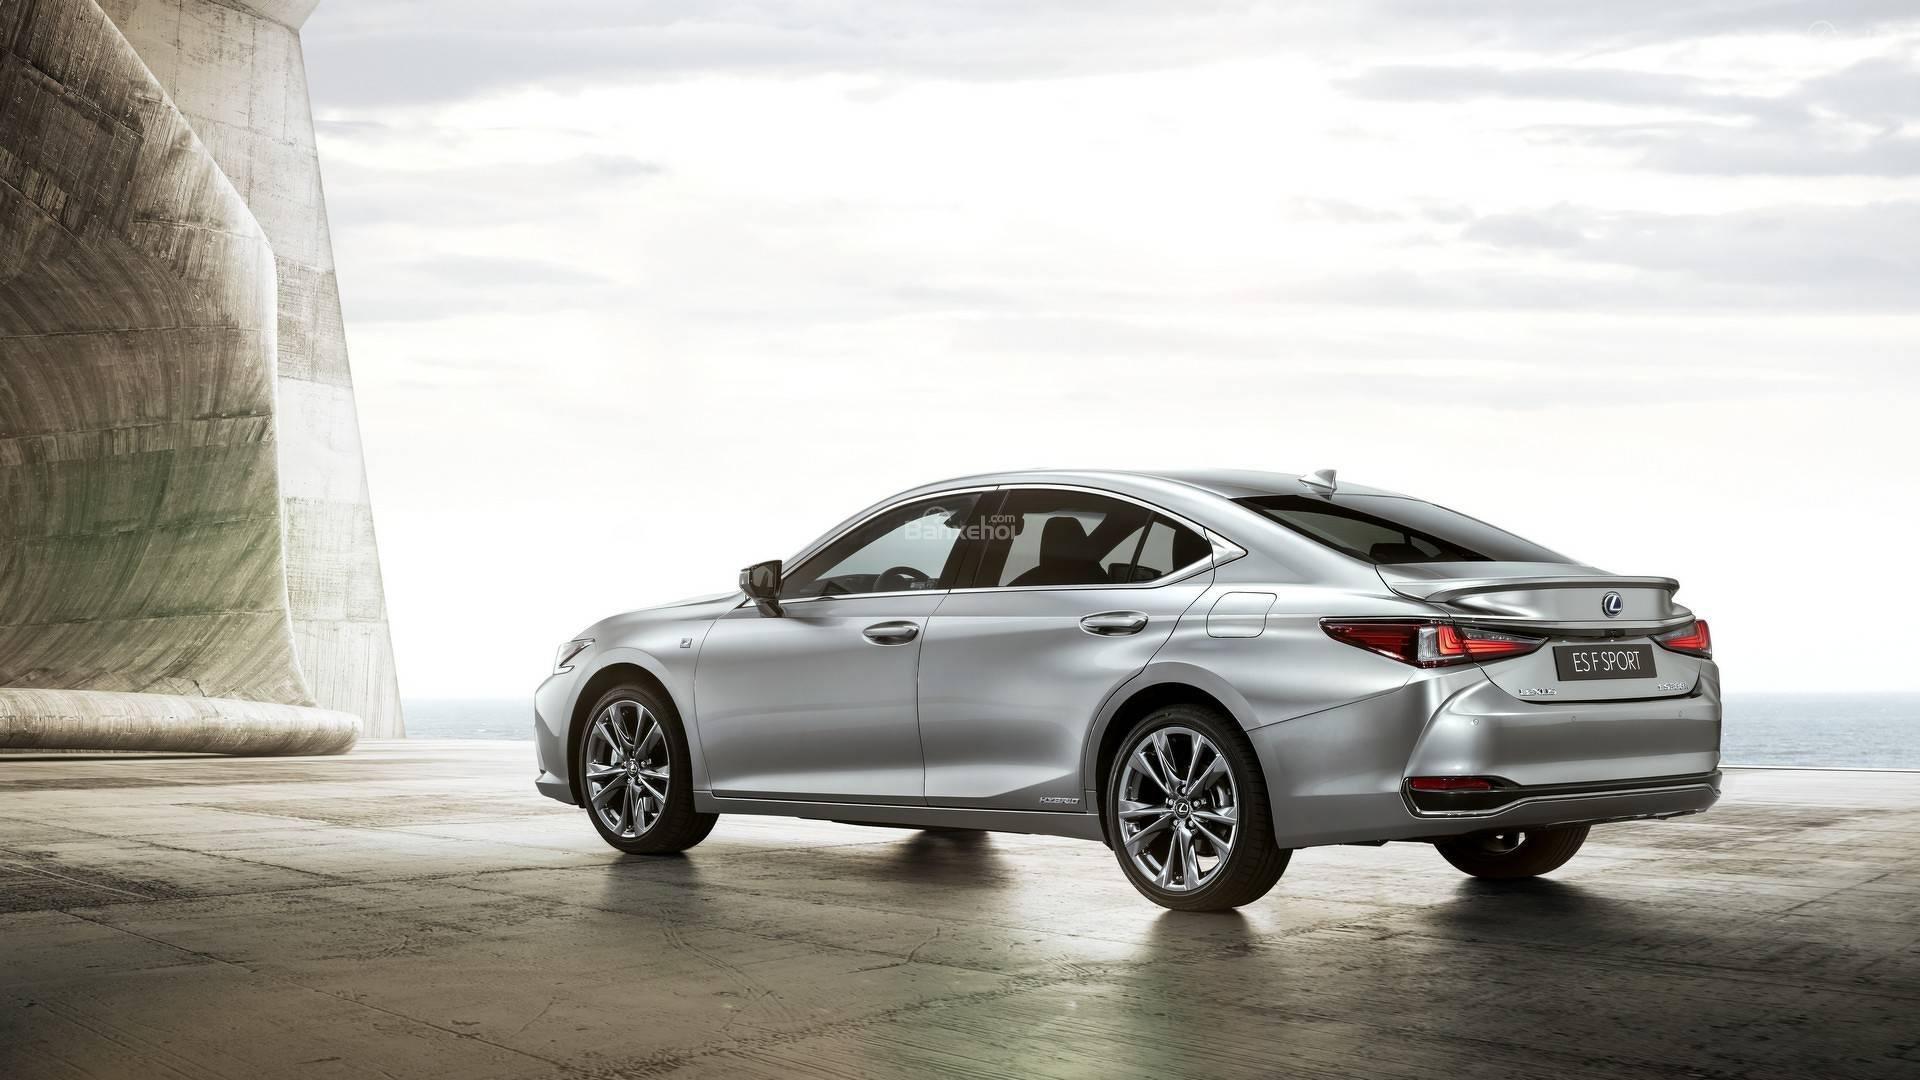 Đánh giá xe Lexus ES 2019 về cảm giác lái 1a